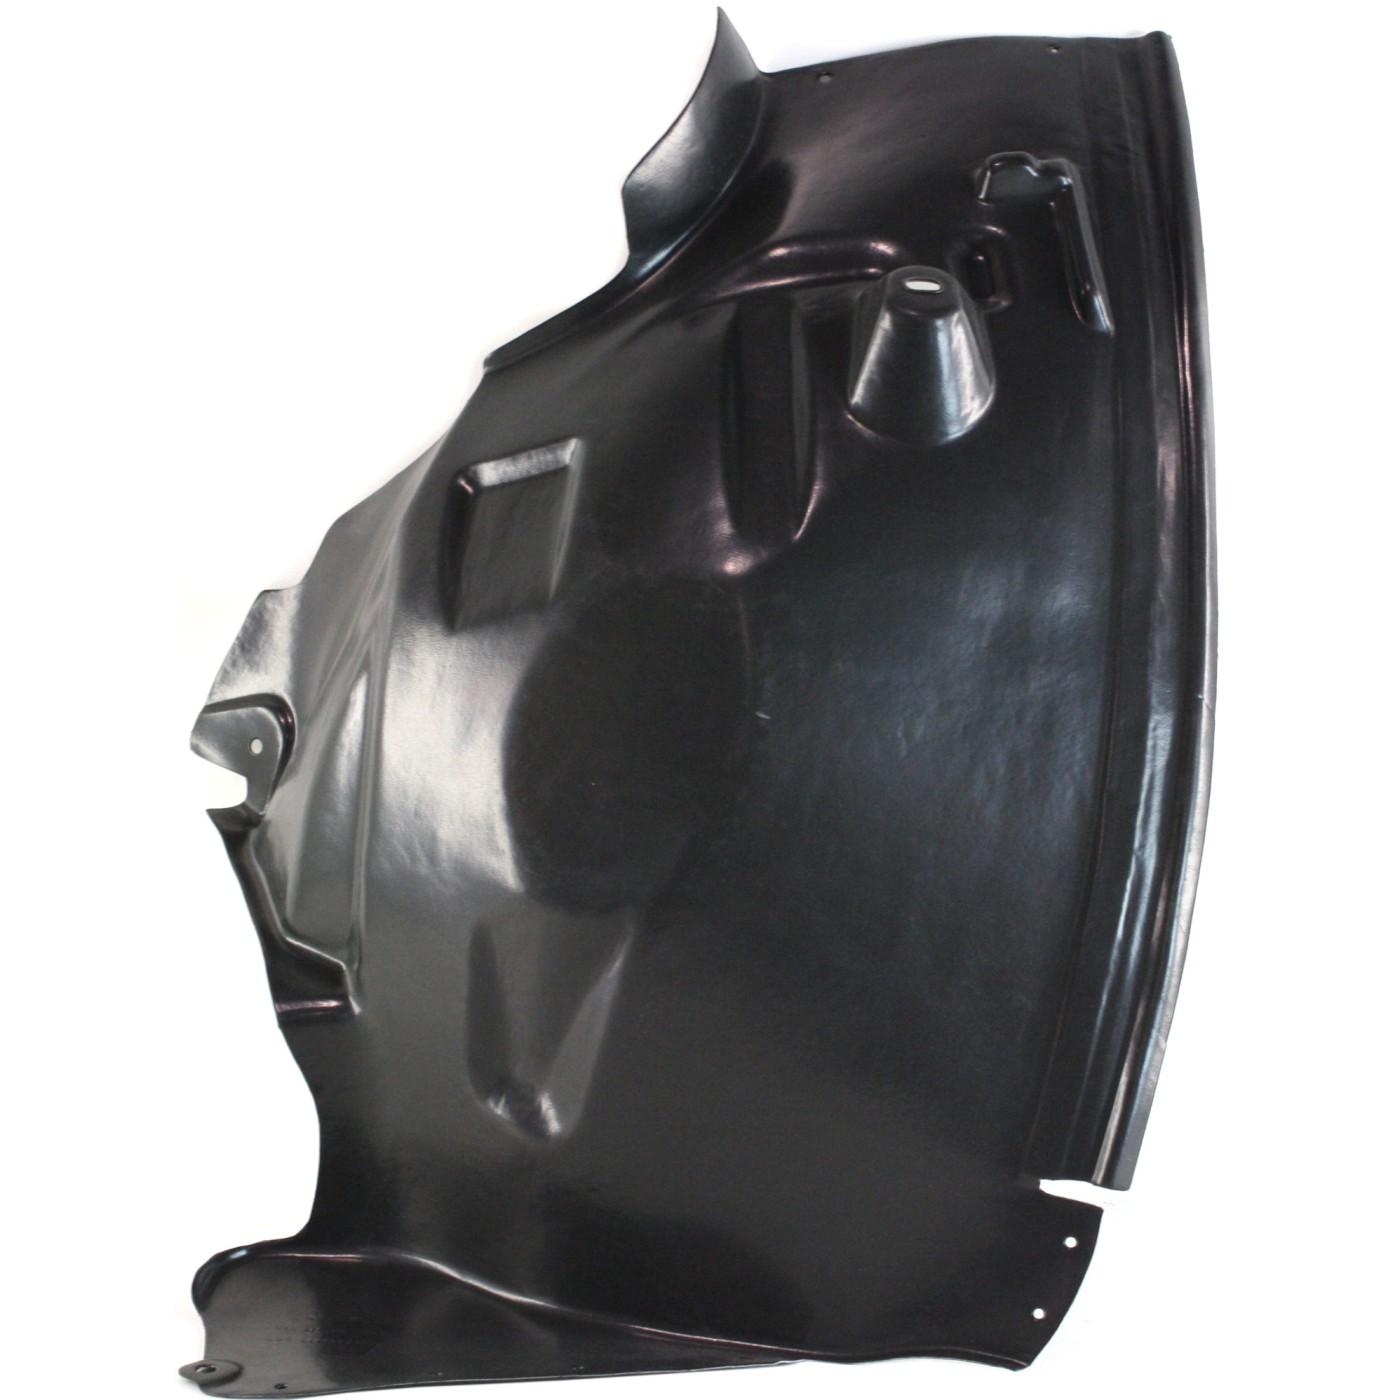 Splash Shield For 2006-2010 Mercedes Benz R350 Front Driver Side Front Section